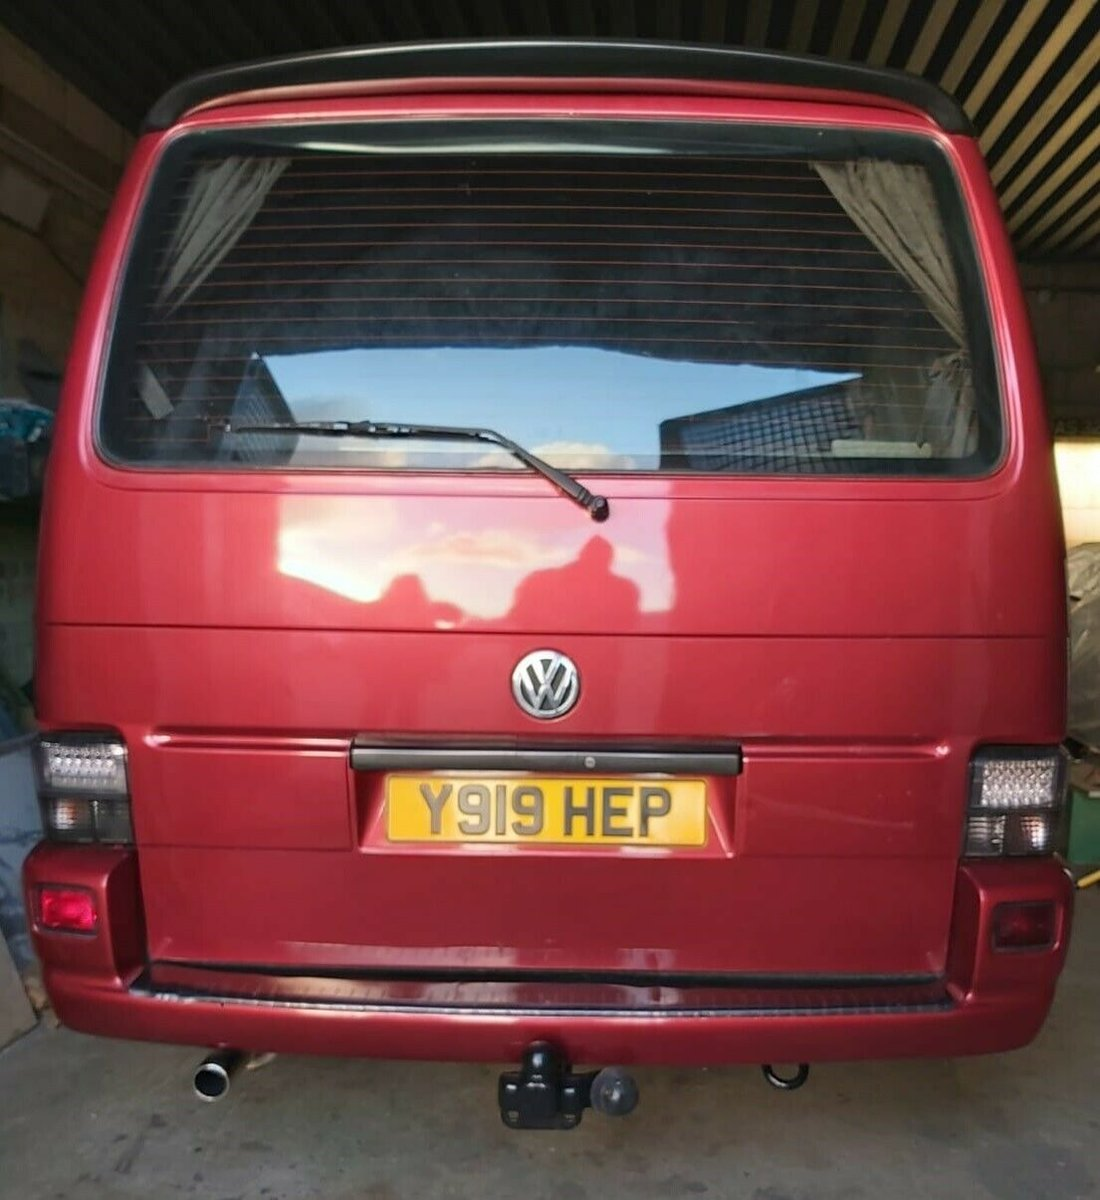 2002 Volkswagen T4 campervan 1.9TD For Sale (picture 4 of 10)